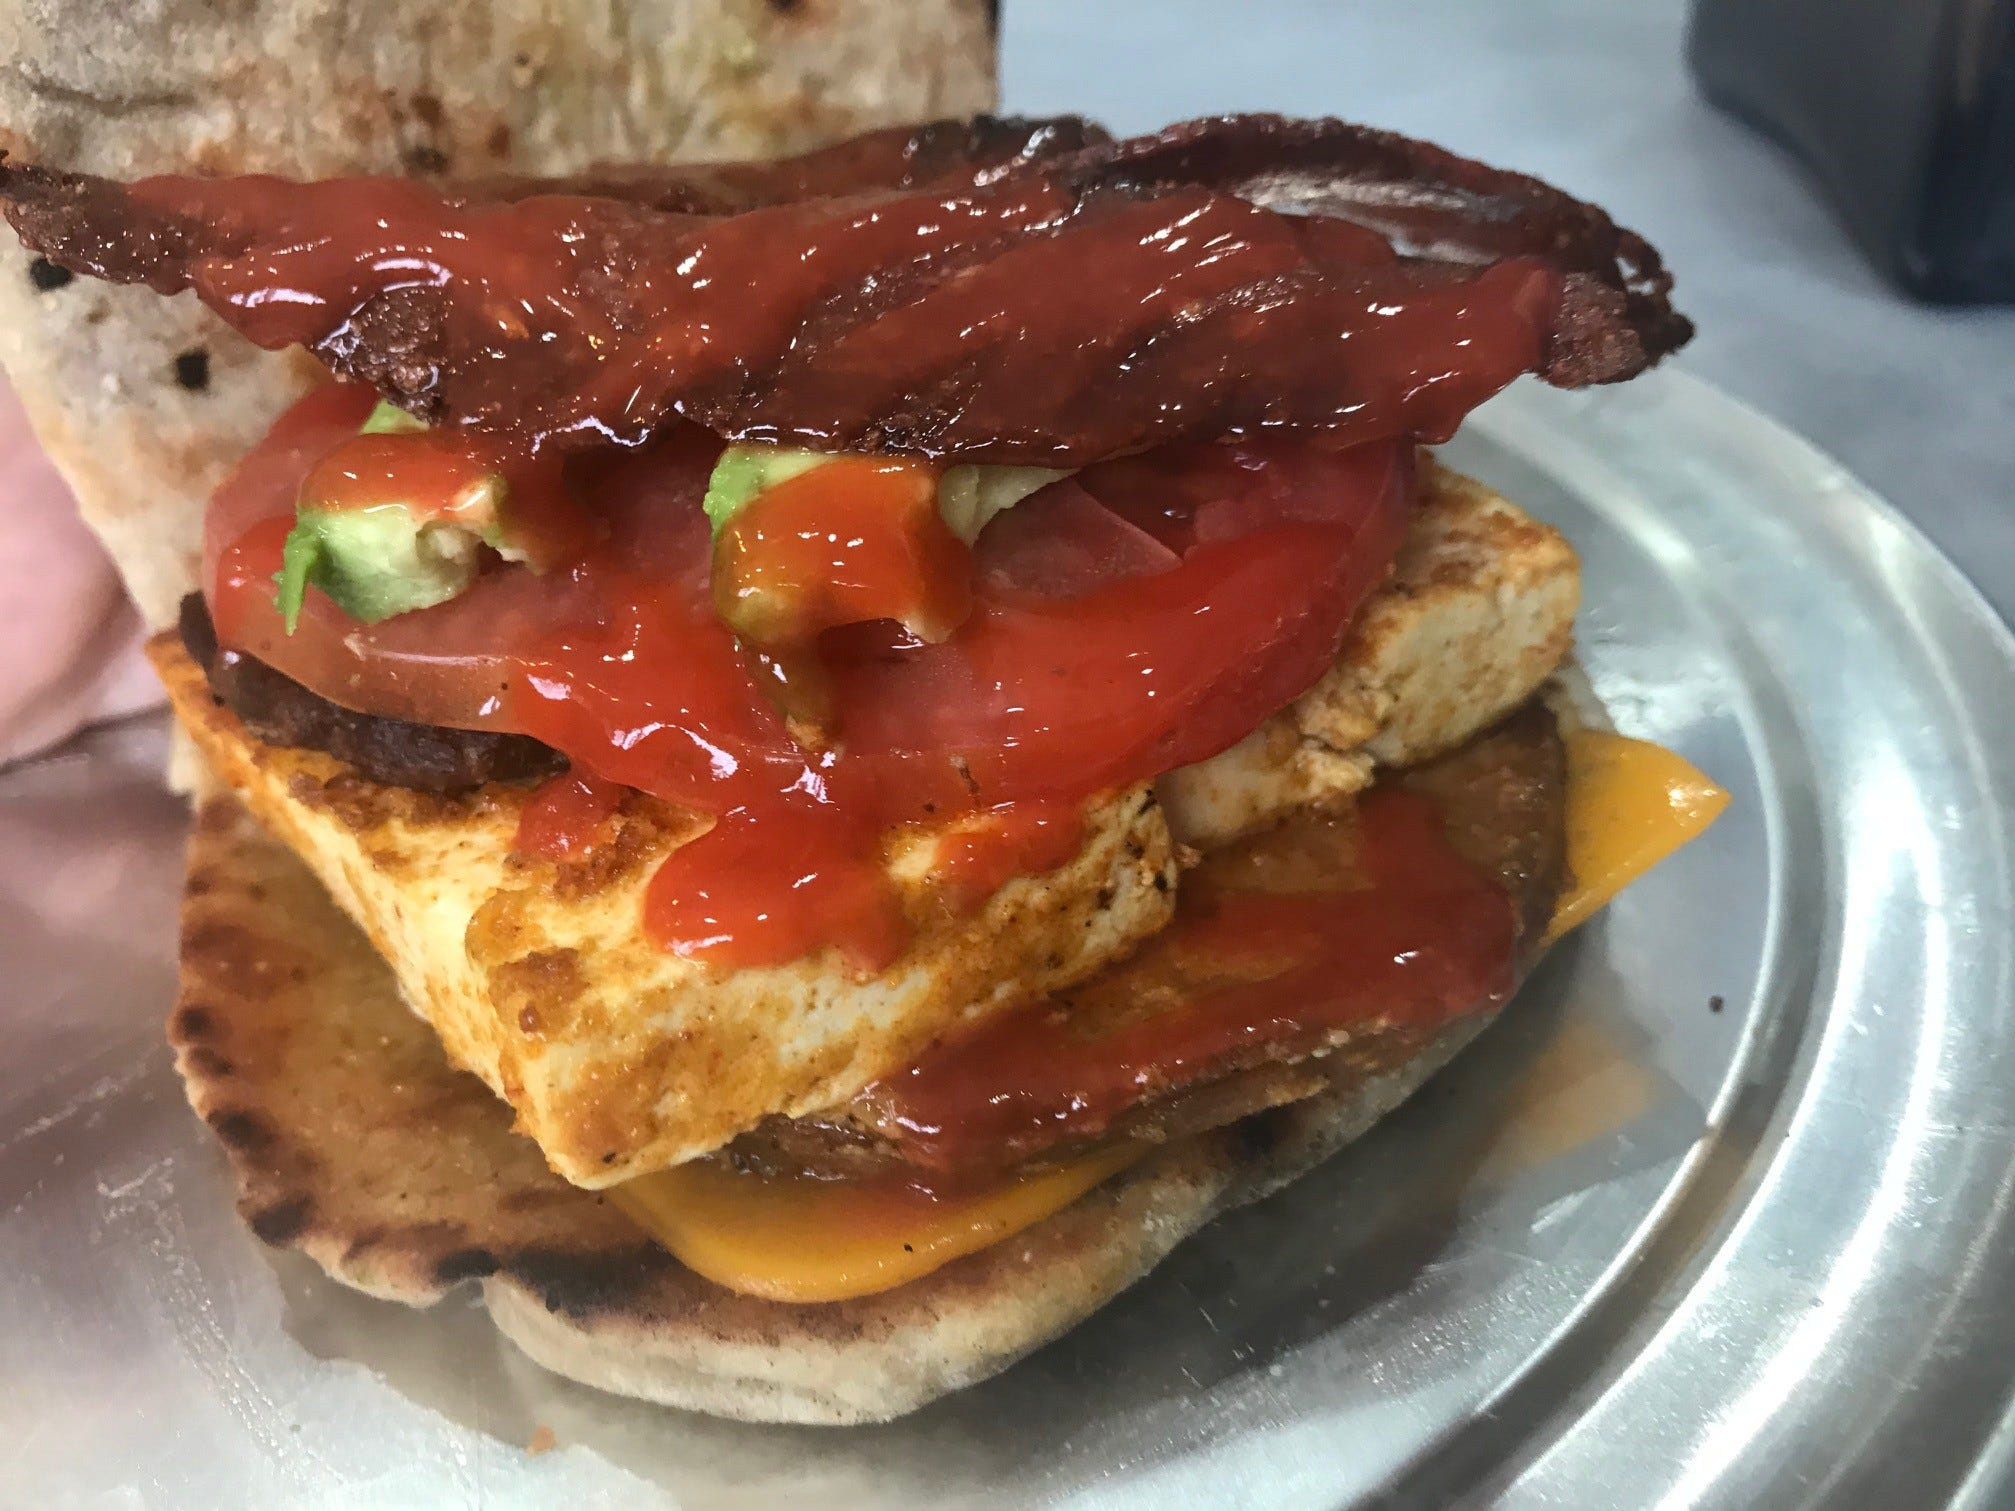 A vegan pork roll sandwich from Alternative Plate in Lake Como.